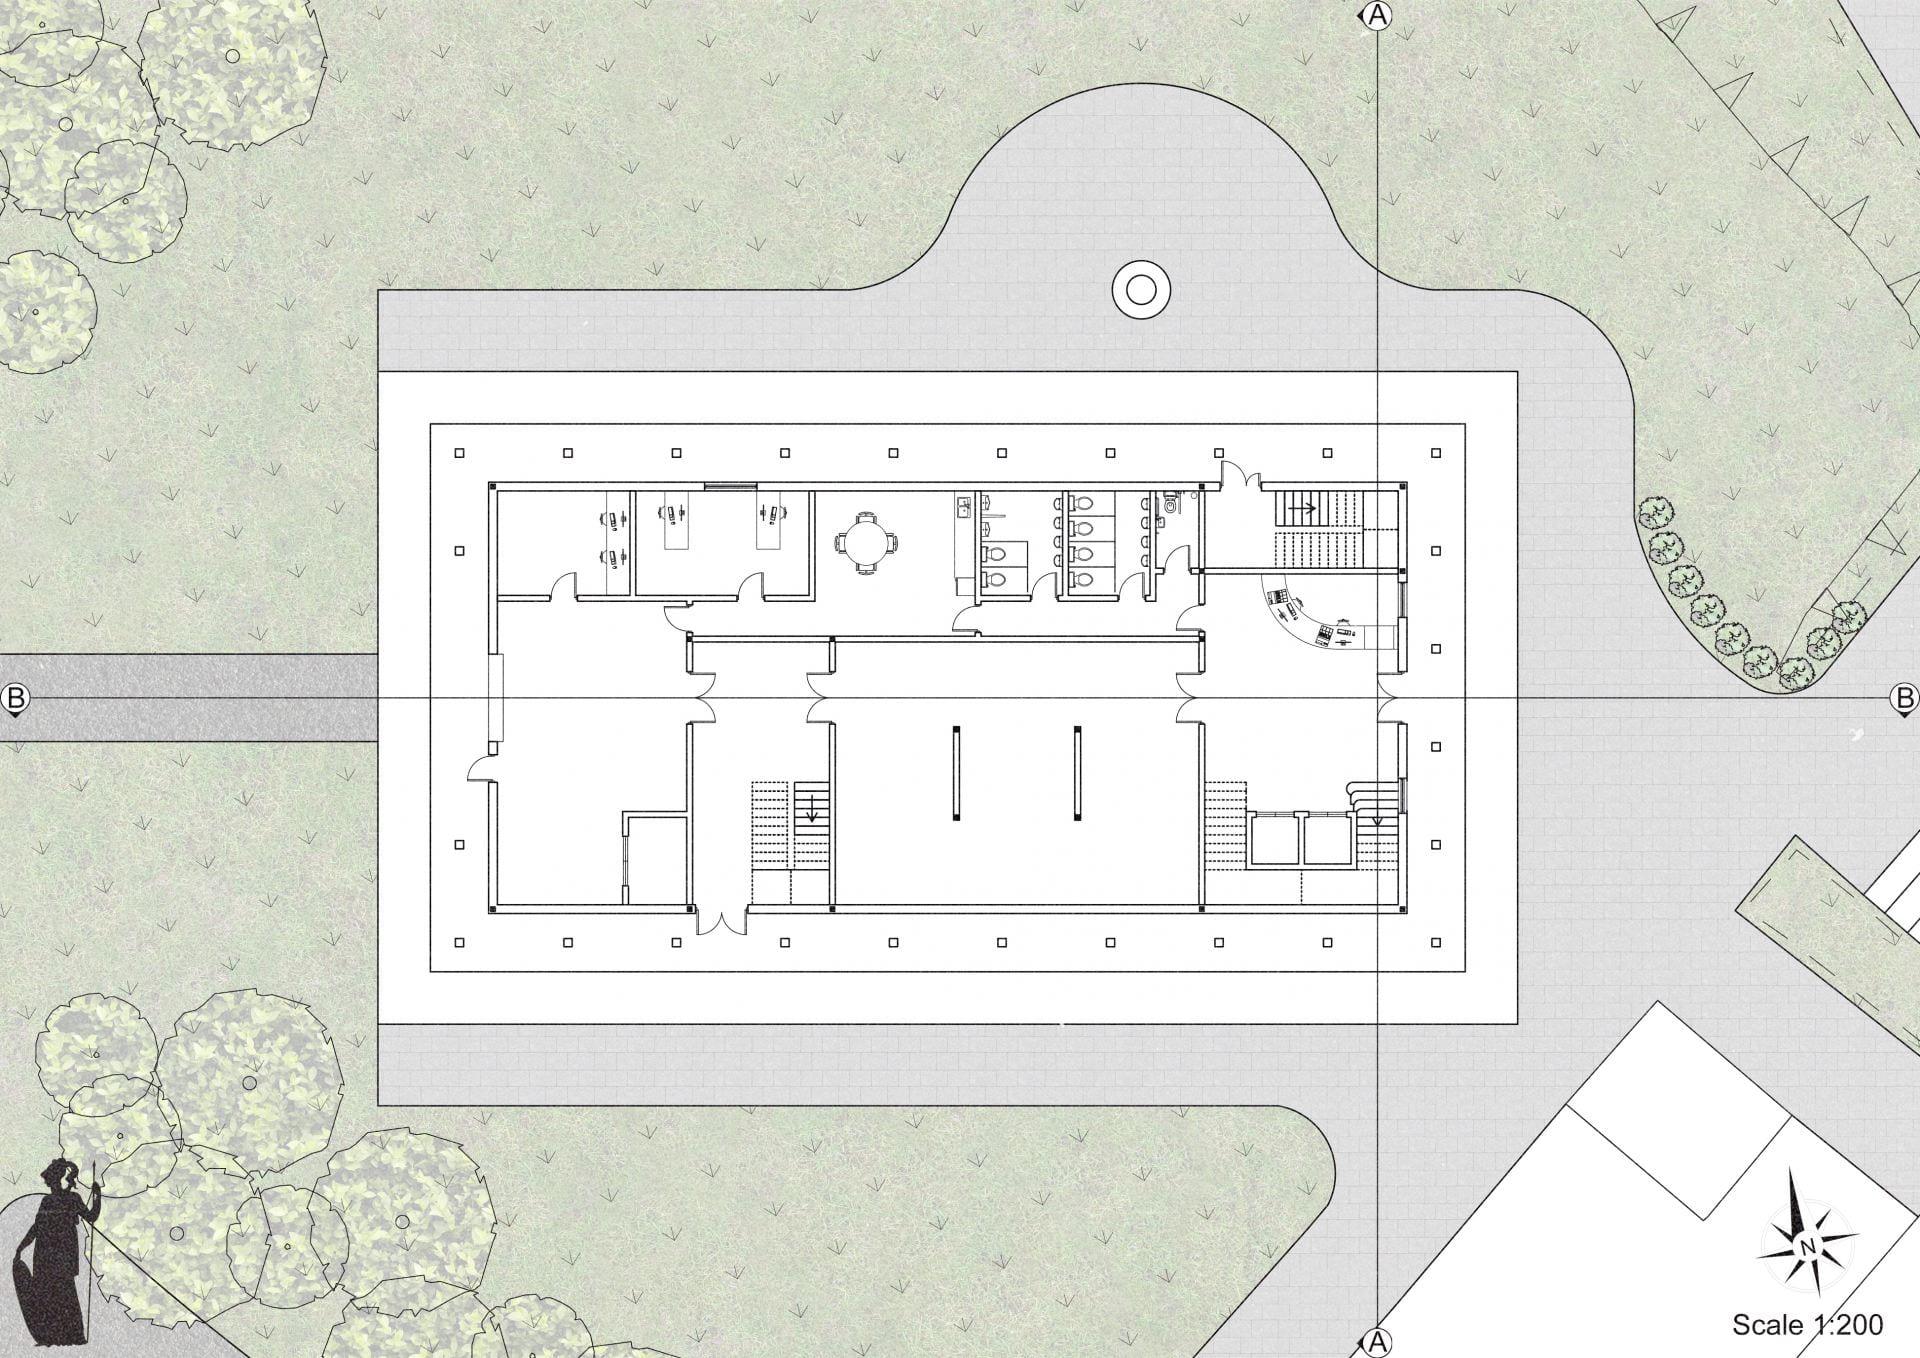 Ground Floor Plan of the Art Gallery